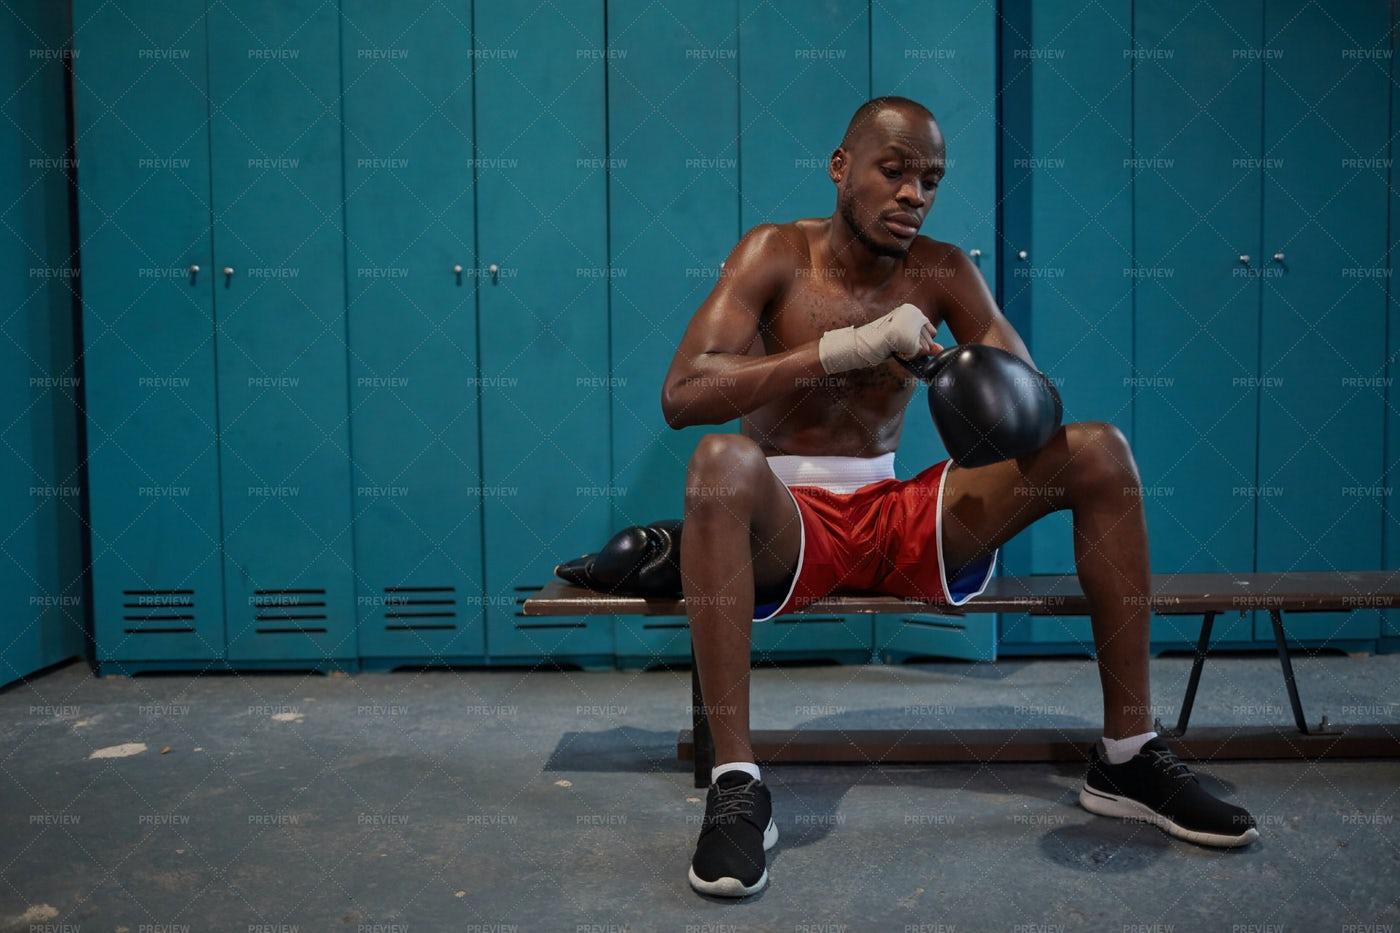 Boxer Sitting In Locker Room: Stock Photos